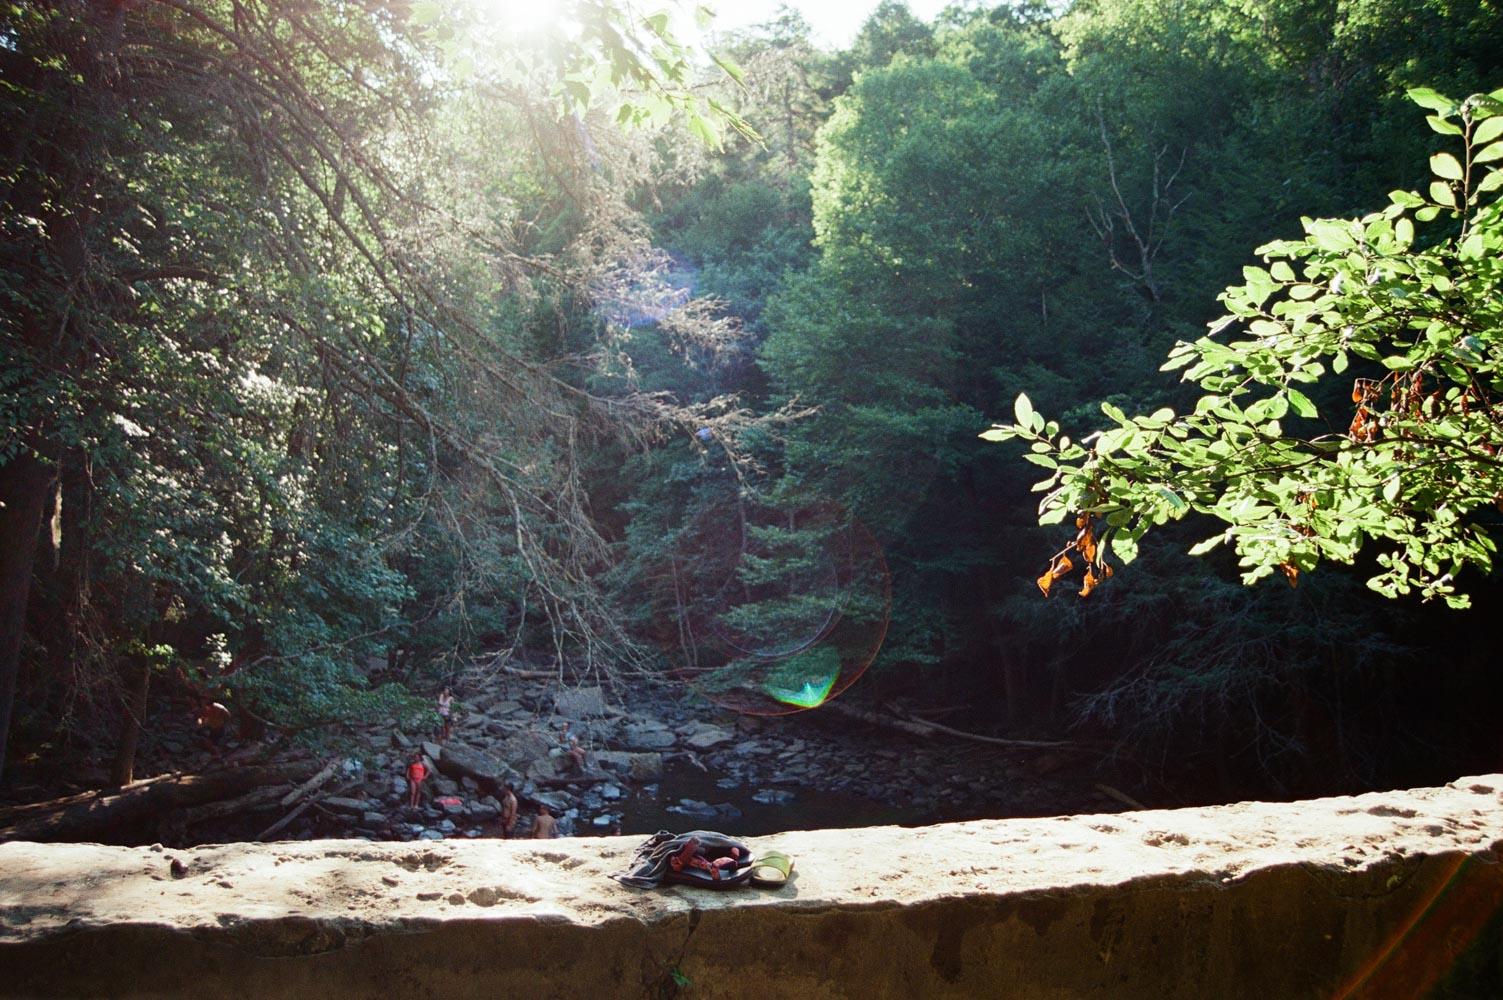 8.27.hamilton-creek-photography-daily-project-teenage-portraits-tampa-161463020010